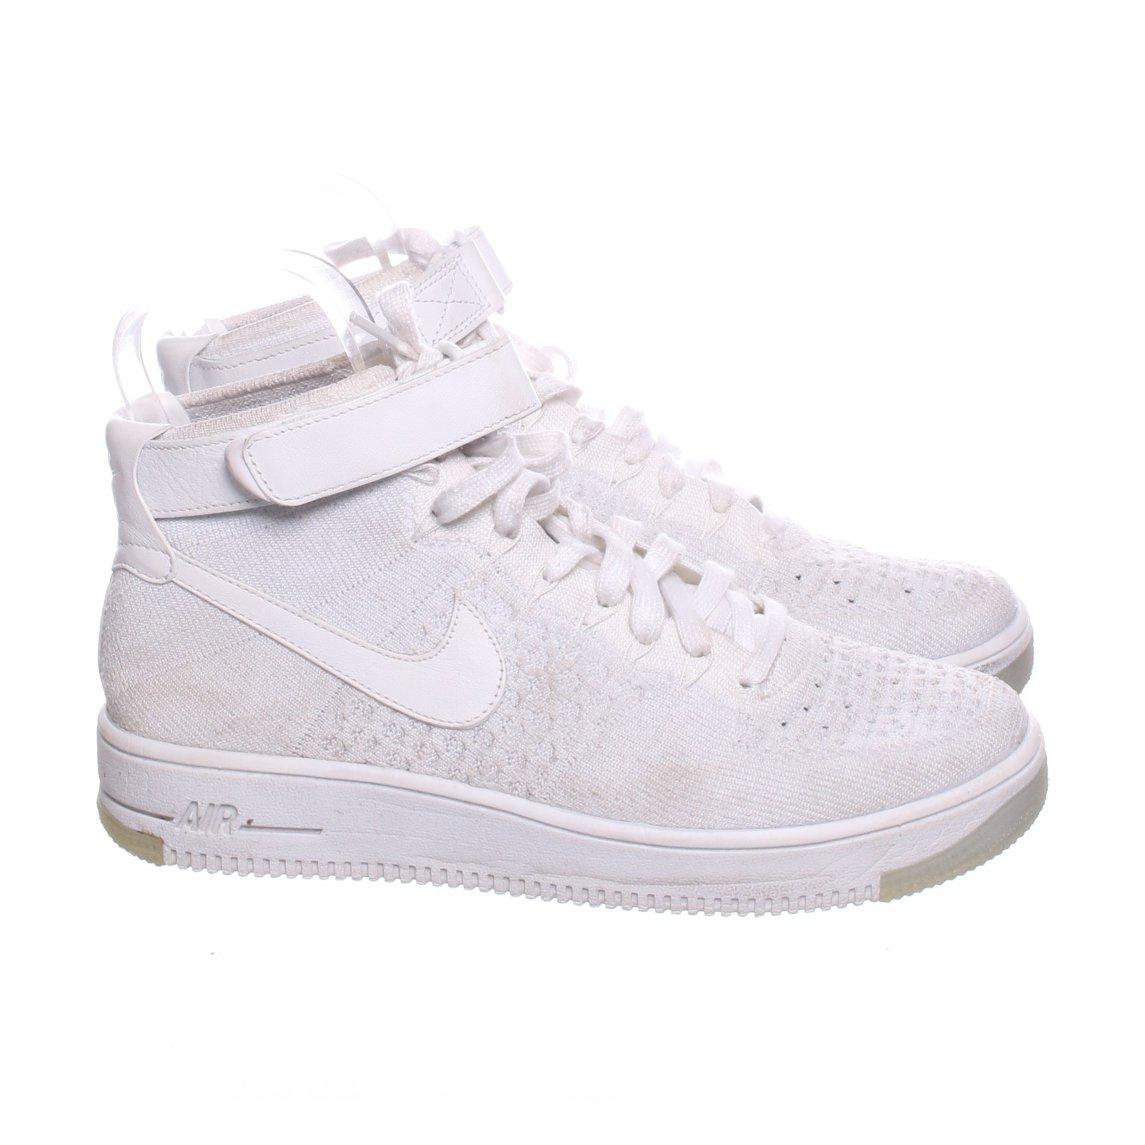 sports shoes 907f8 34aa7 Nike, Sneakers, Strl  42, Air Force 1 Flyknit, Ljusgrå Vit